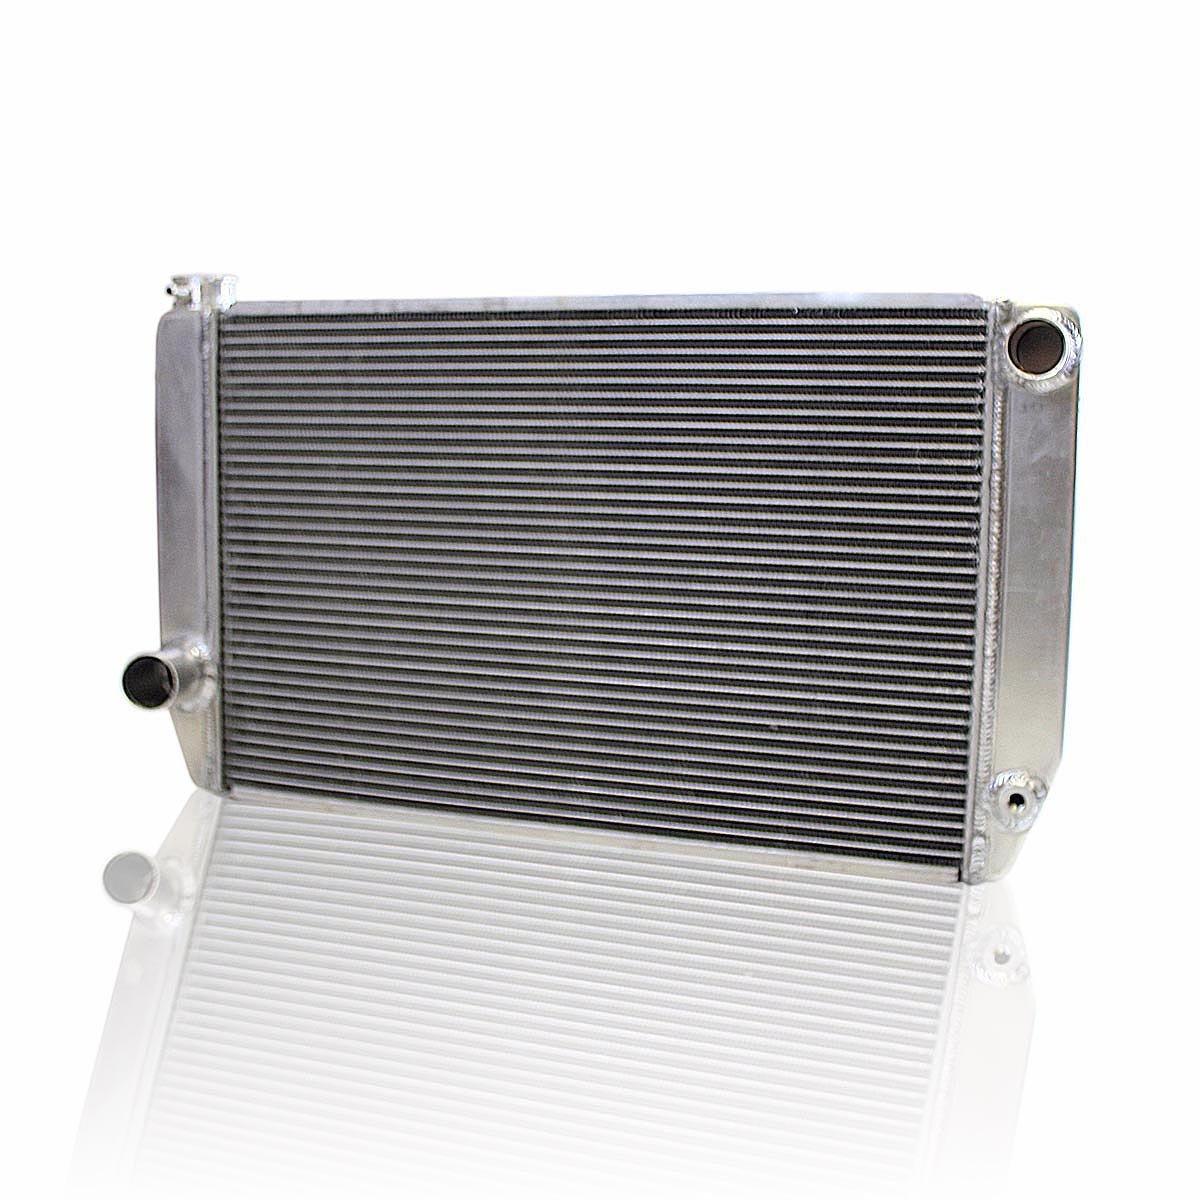 Griffin Radiator  1-26271-XS ClassicCool 31' x 16' 2-Row Universal Fit Cross Flow Radiator with 1' Tube